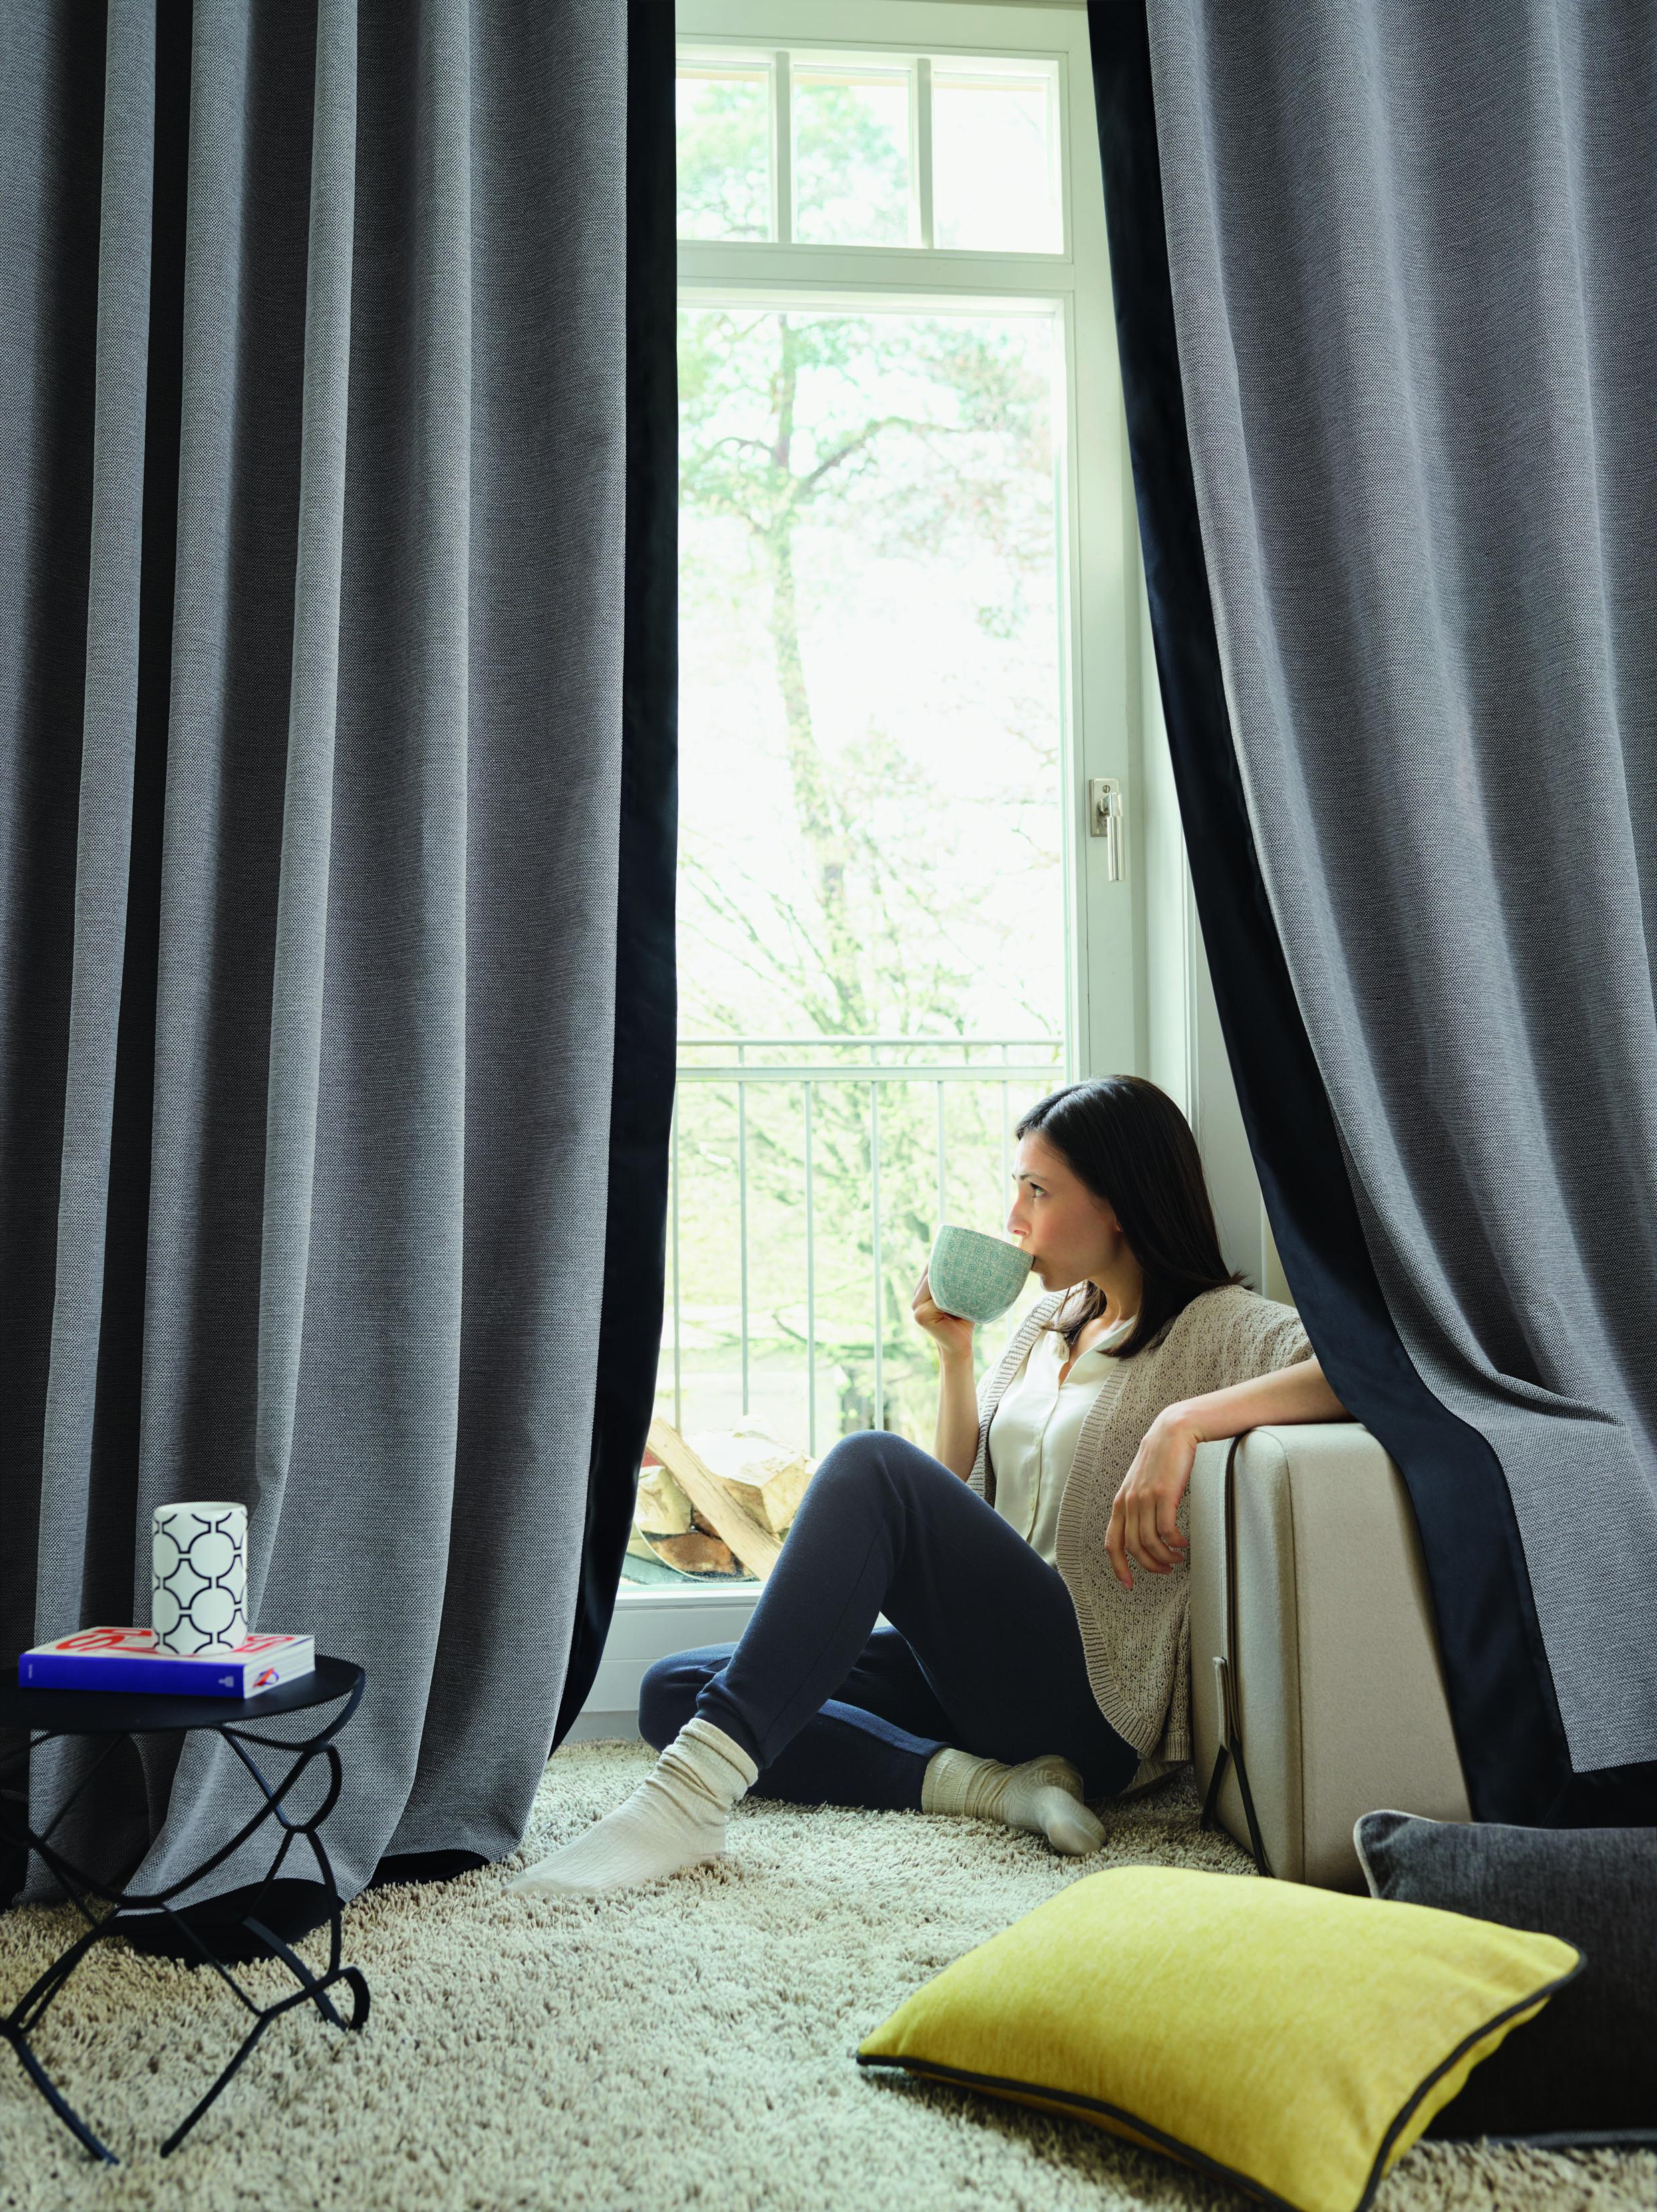 kuschelige k lteschutz thermo stoffe raumausstatter. Black Bedroom Furniture Sets. Home Design Ideas